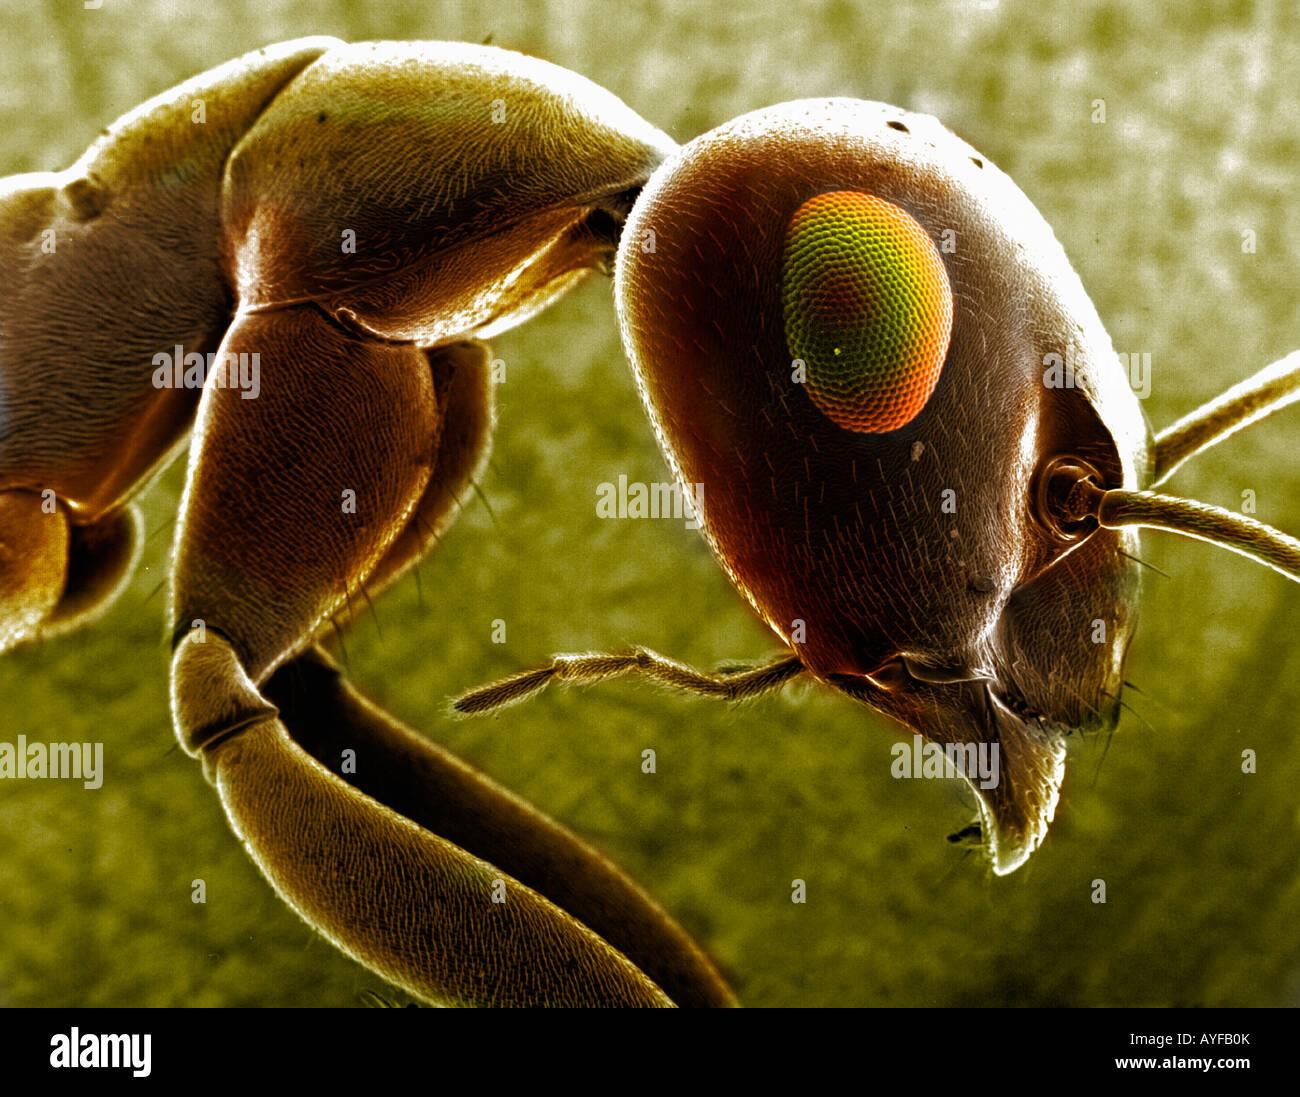 Ant vistos a través de un microscopio de EM Imagen De Stock